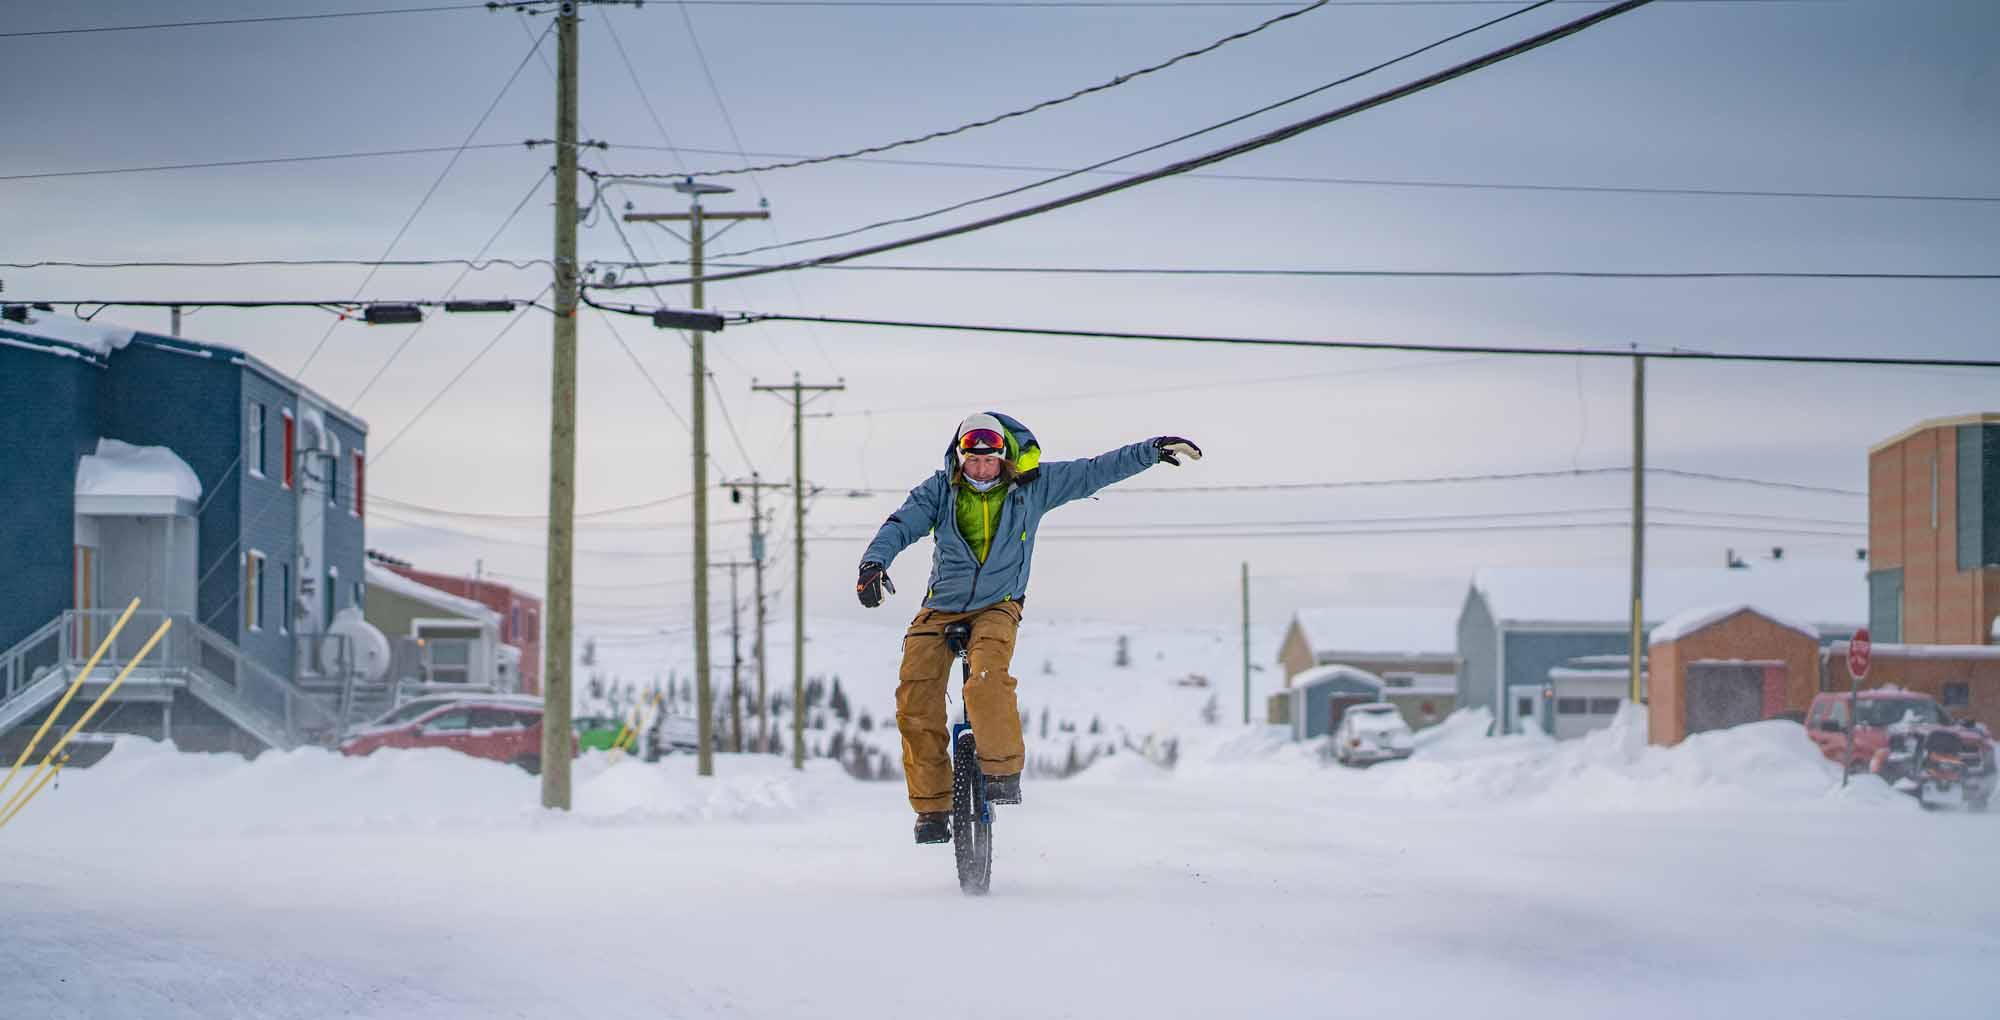 Arctique-quebecois-Lecons-de-Kuujjuaq-Quebecs-Arctic-Daniel-Keith-Cooper-NUNAVIK-2020-unicycle-winter-townscape